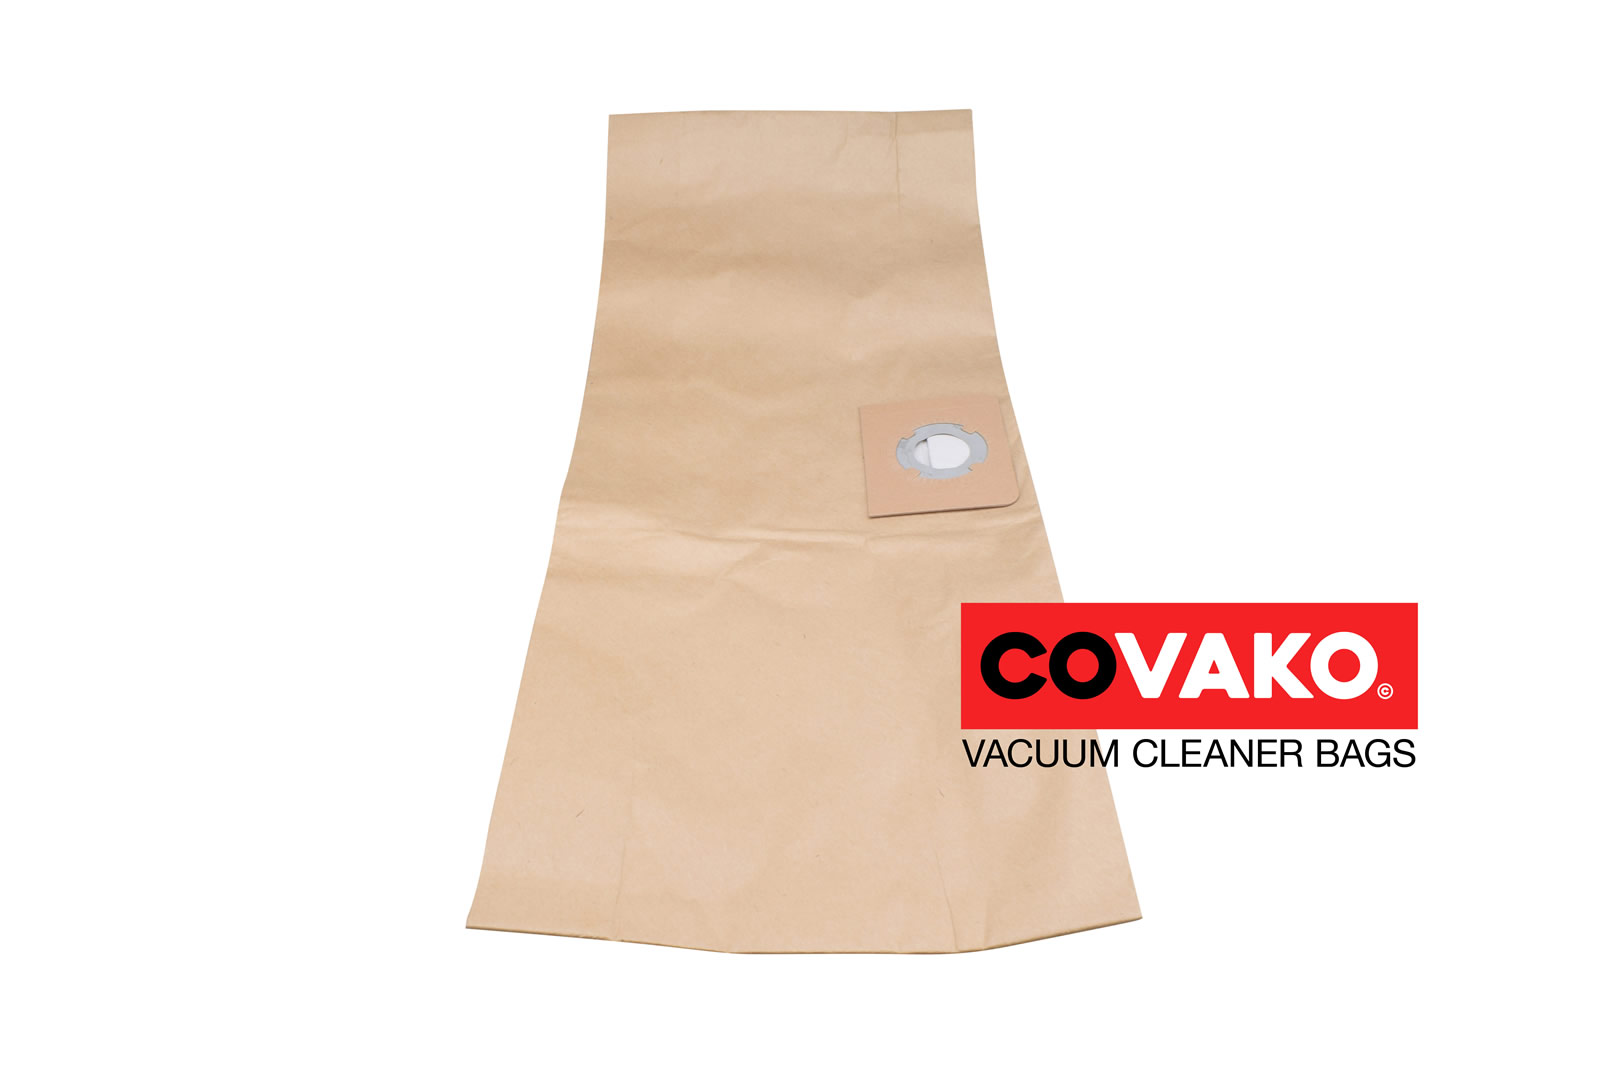 Lavor GB 32 / Papier - Lavor stofzuigerzakken